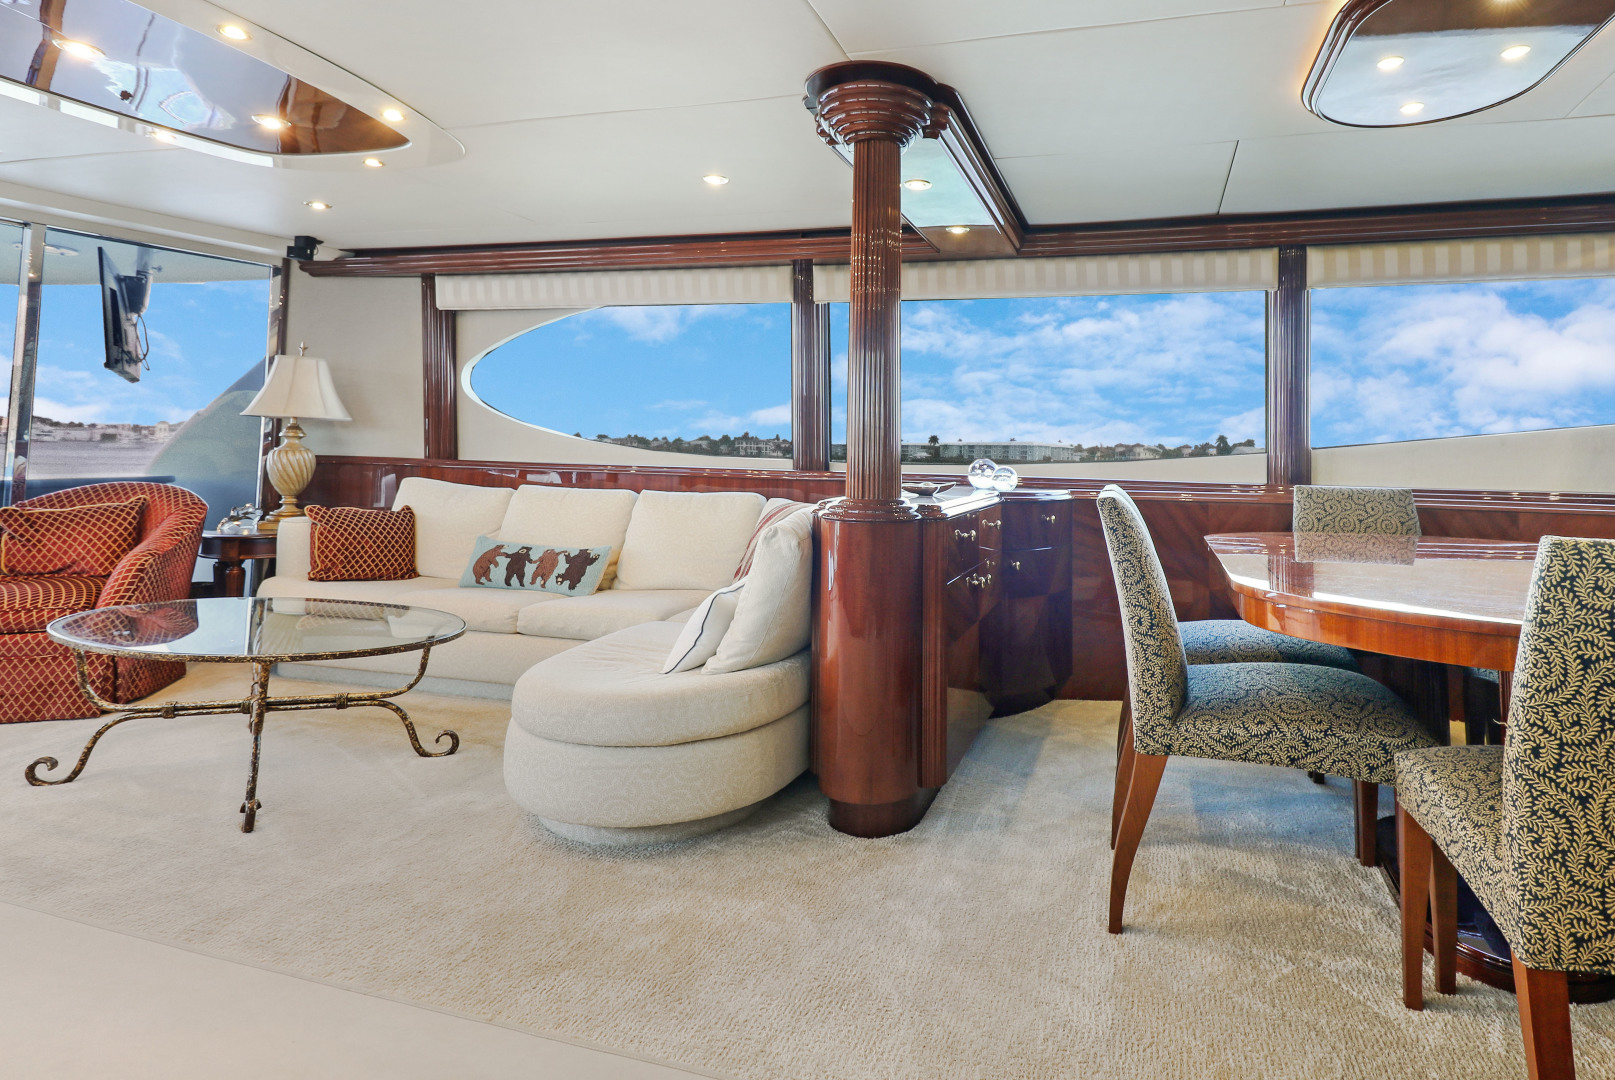 Lazzara-Sky Lounge 2002-Sea Bear Florida-United States-1419771   Thumbnail